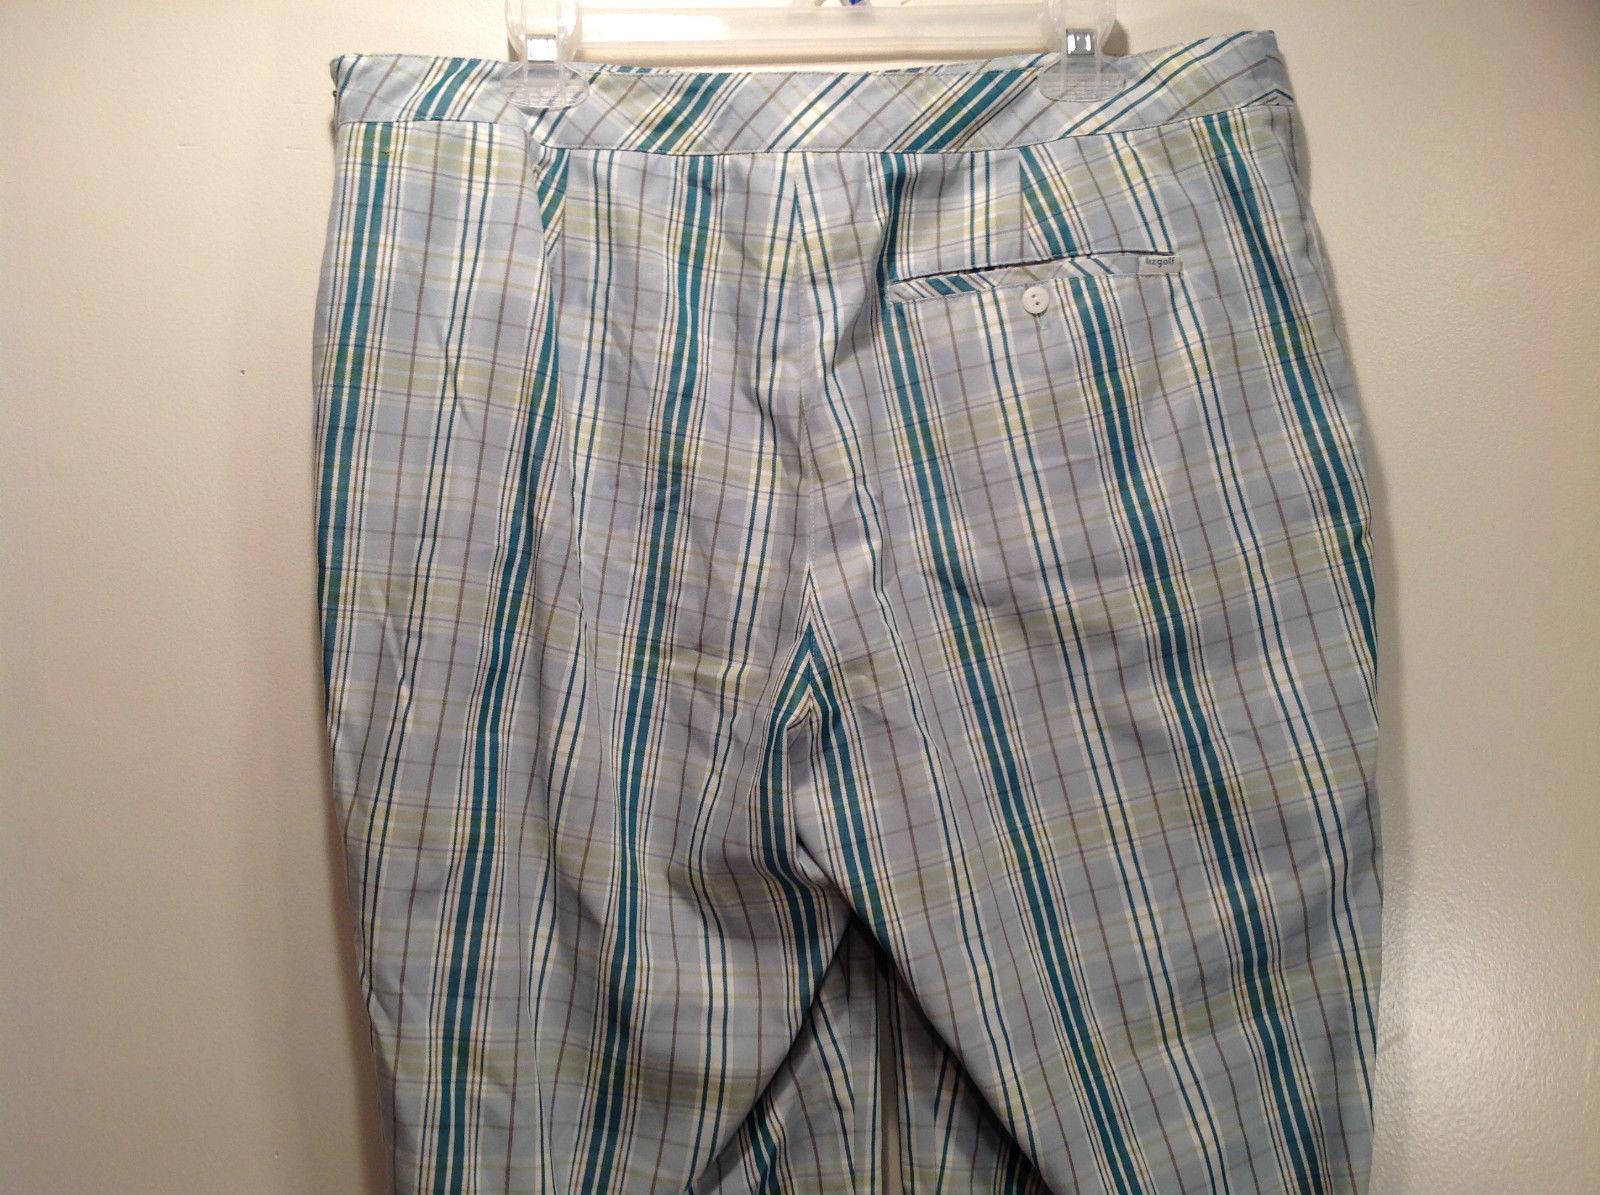 Liz Golf Audra Size 16 Light Blue Green Plaid Casual Pants